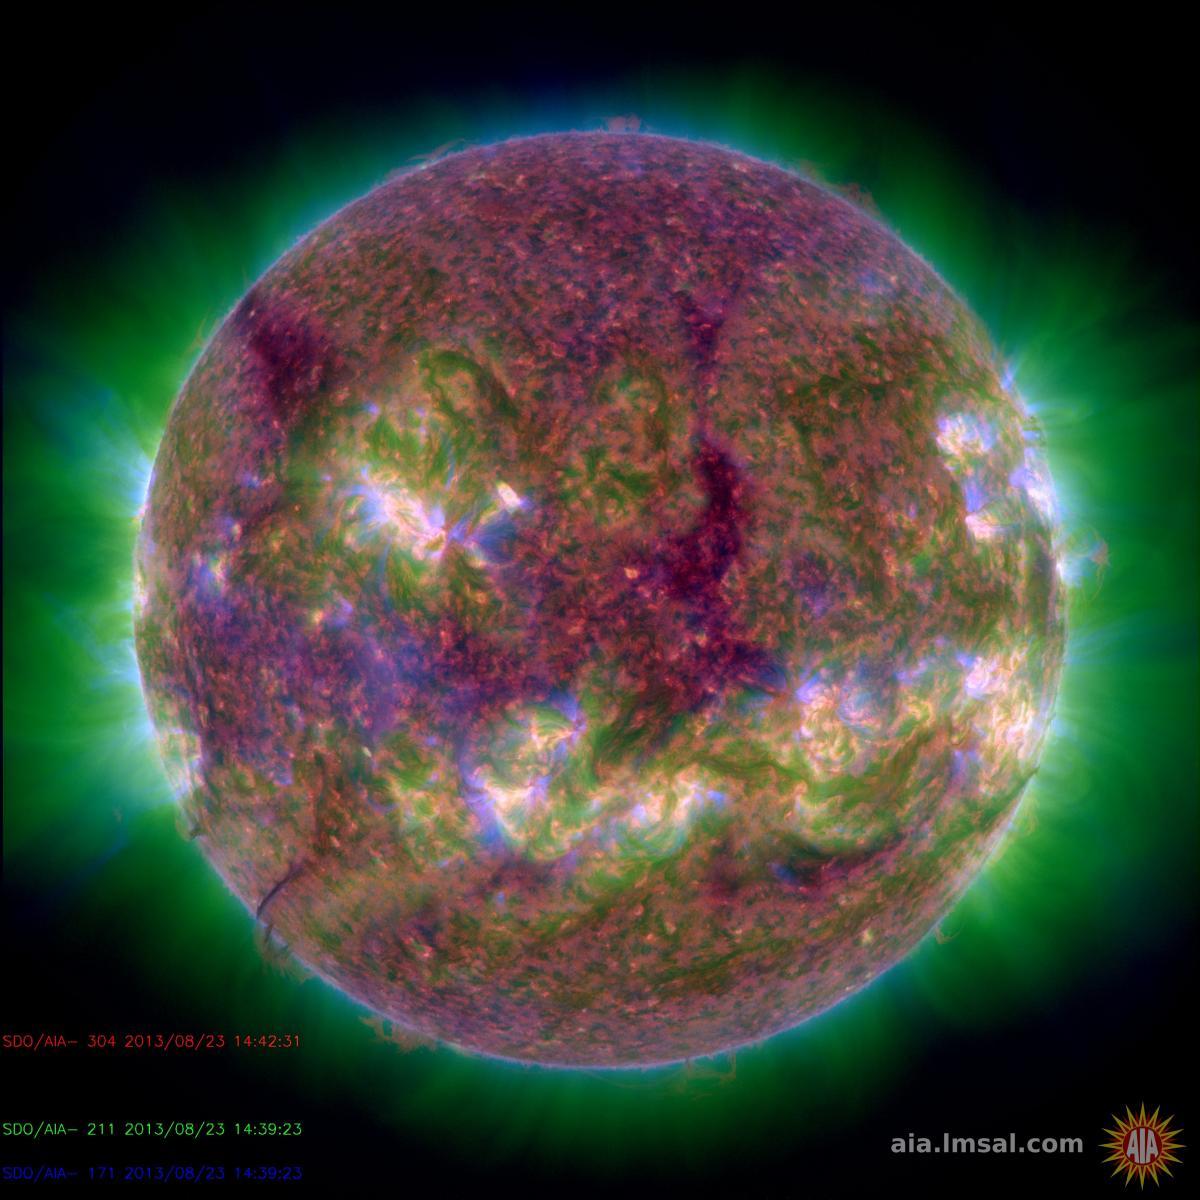 This image combines three images with quite different temperatures.